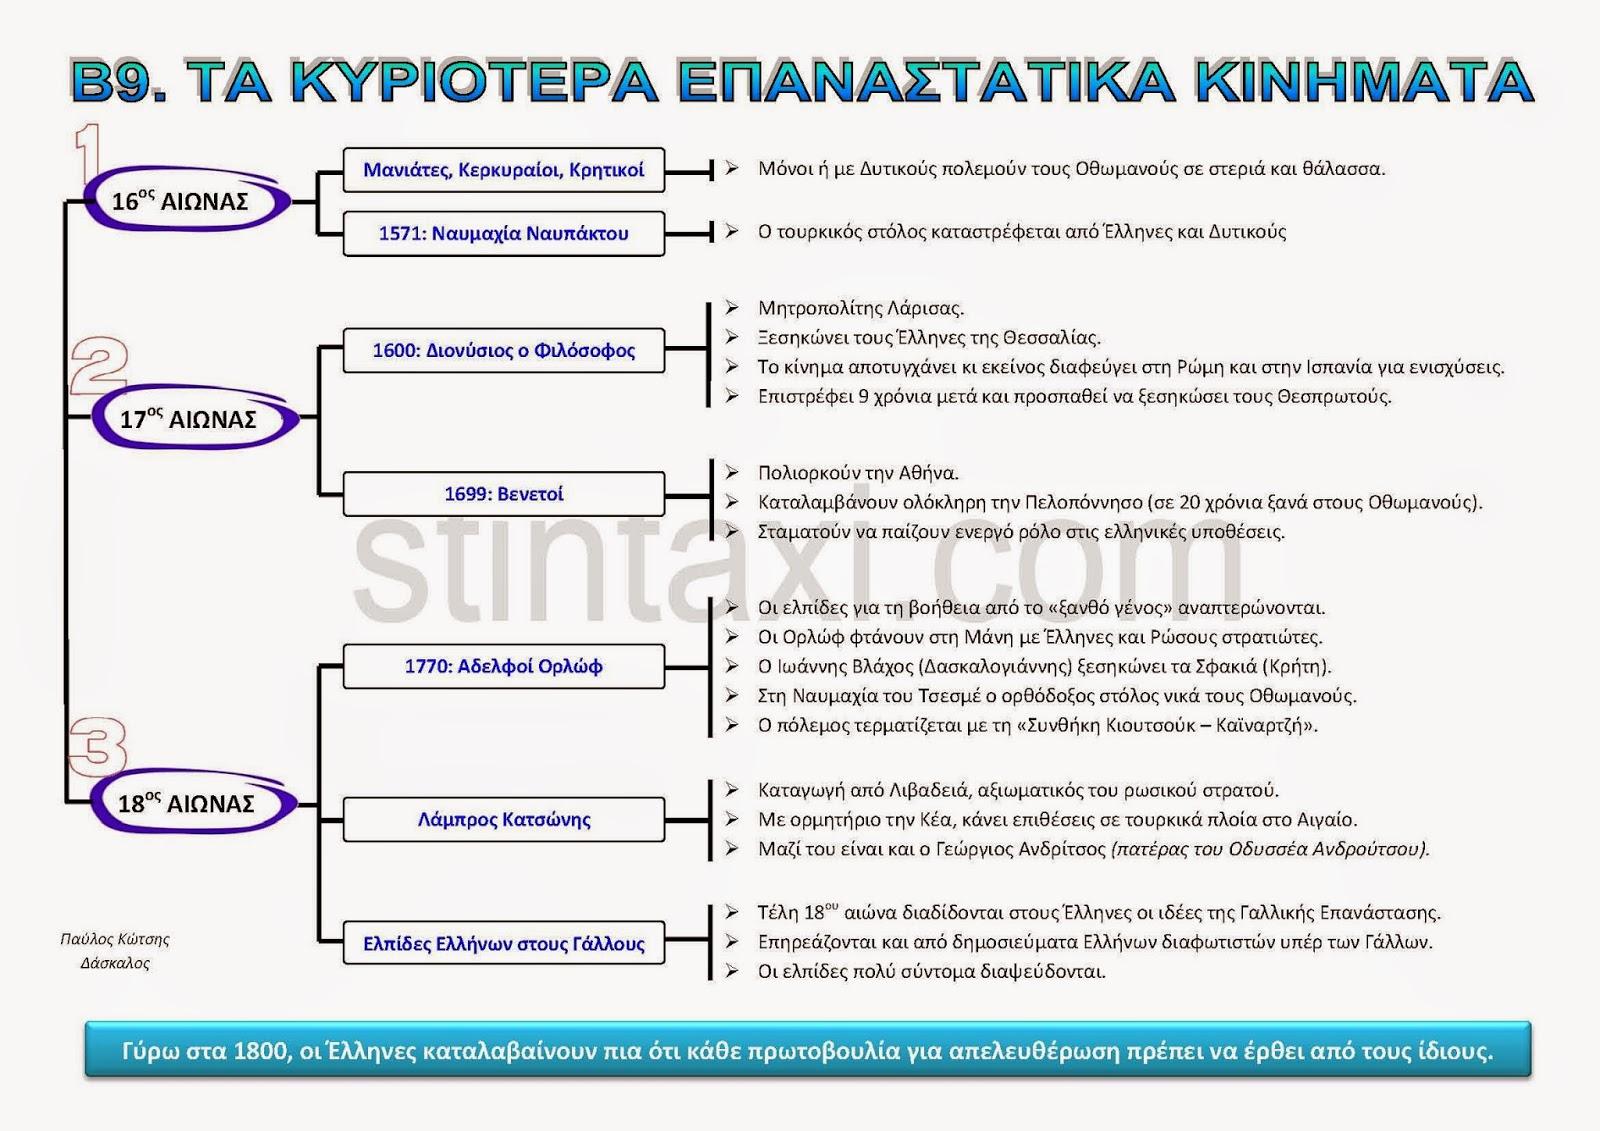 http://www.stintaxi.com/uploads/1/3/1/0/13100858/b9-epanast-kinimata-v2.1.pdf